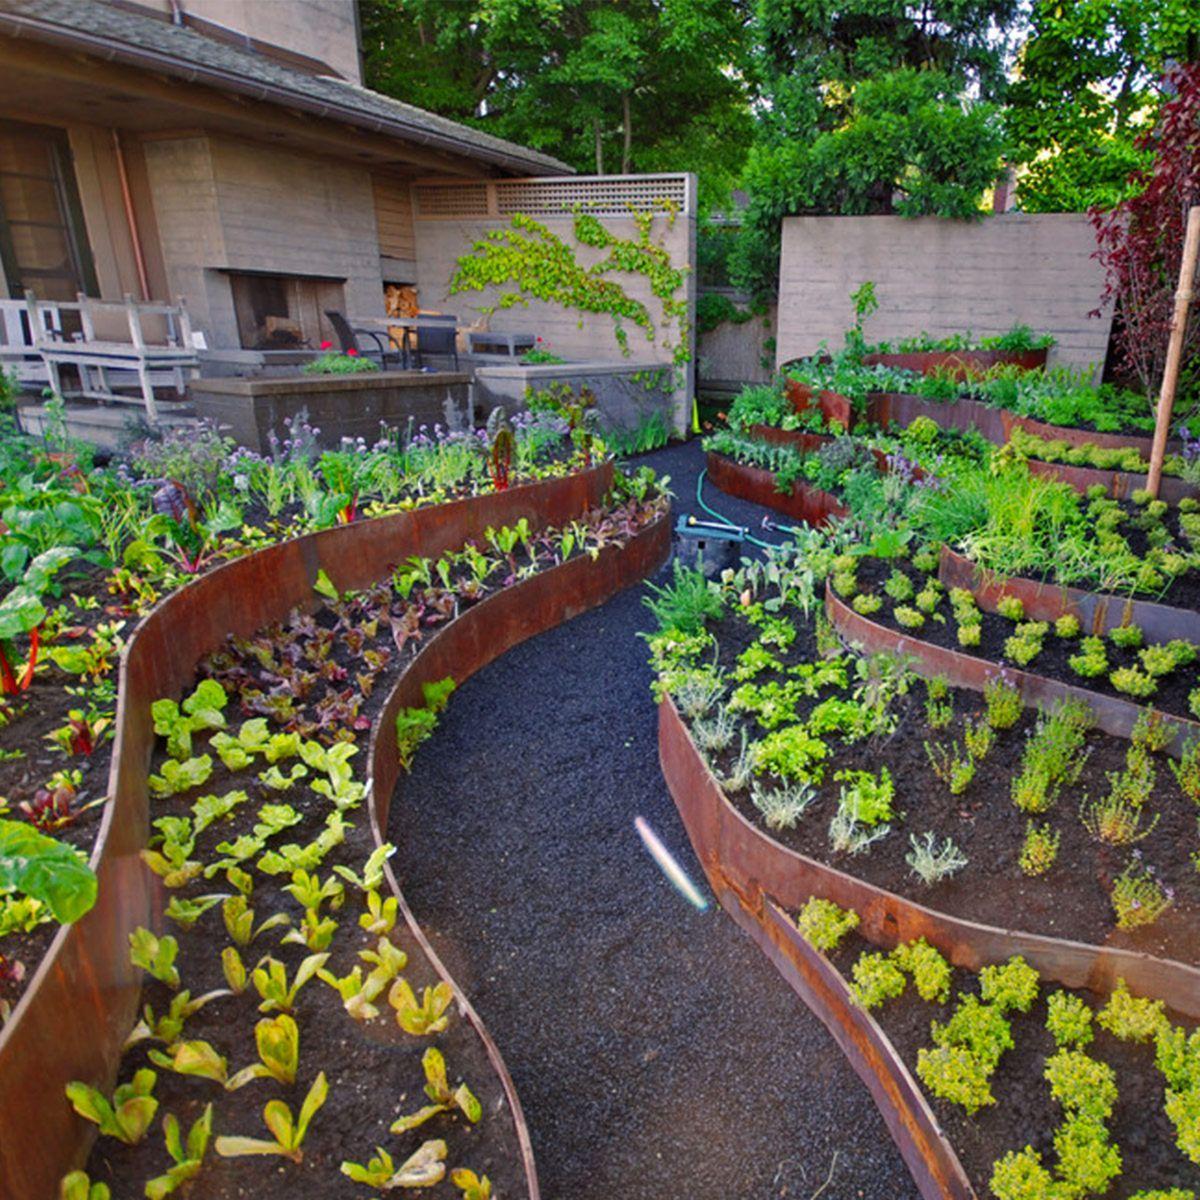 10 Creative Vegetable Garden Ideas: 10 Best Vegetable Garden Designs To Increase Your Home